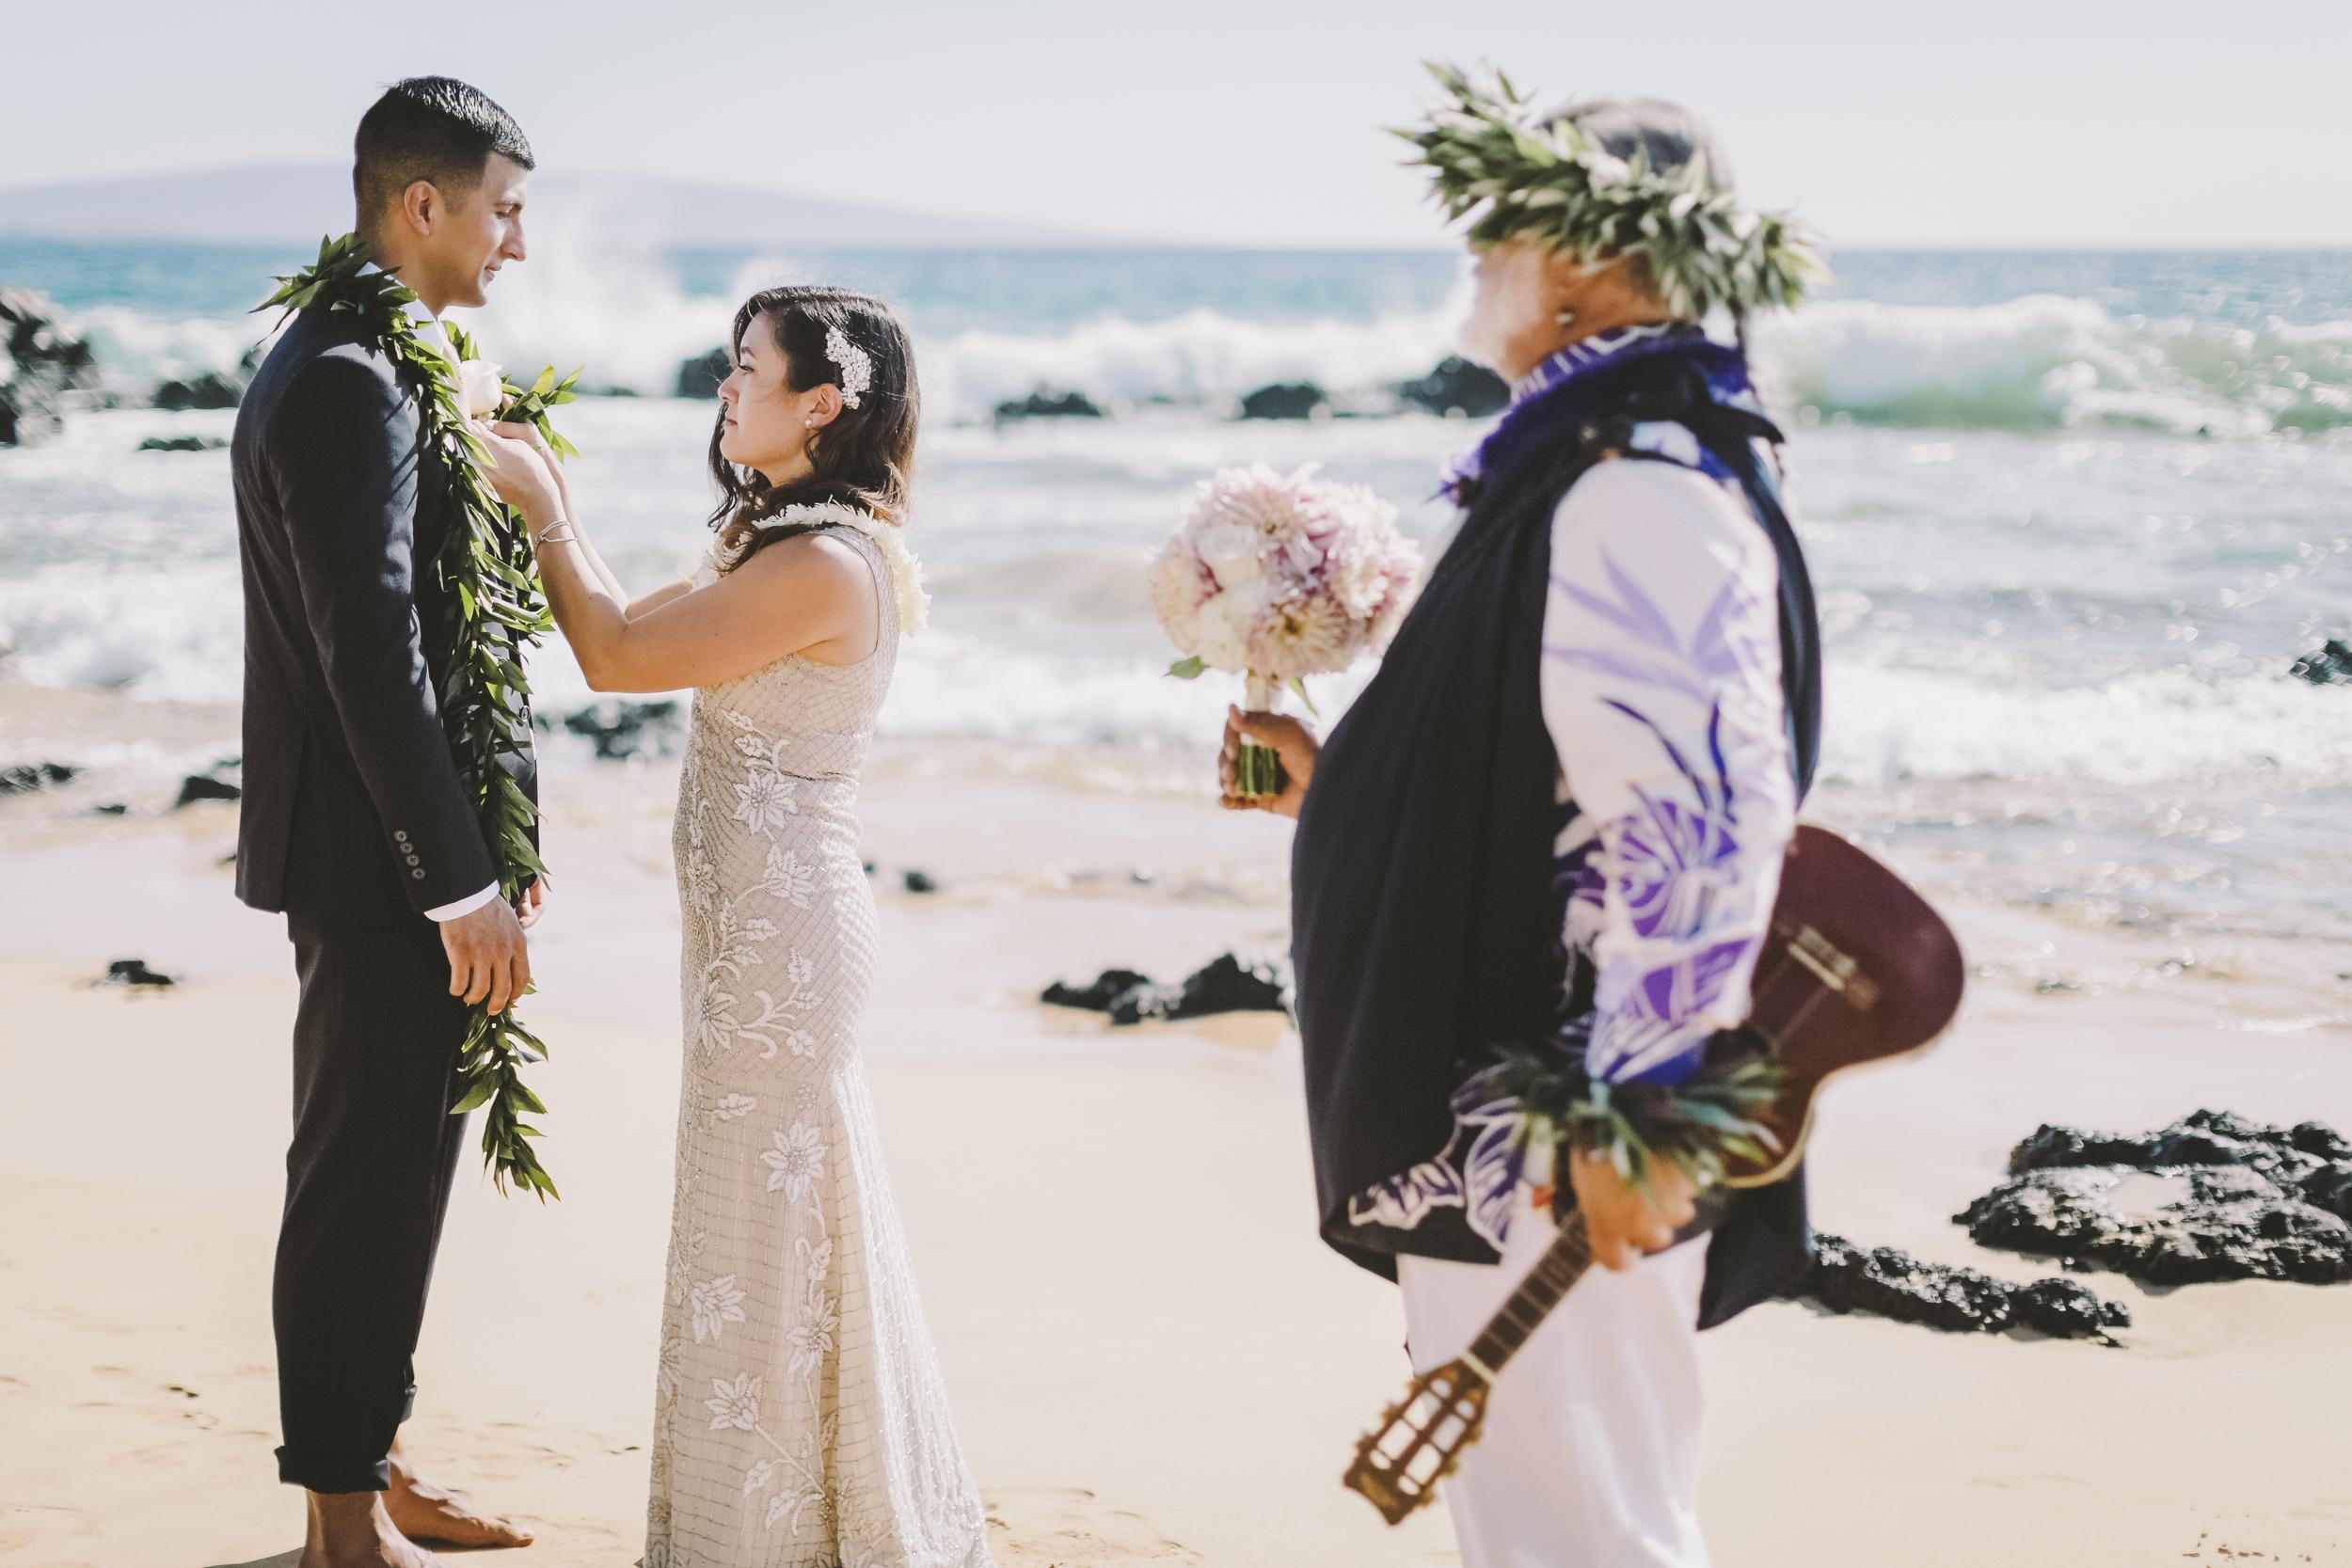 angie-diaz-photography-mokapu-beach-maui-elopement-26.jpg